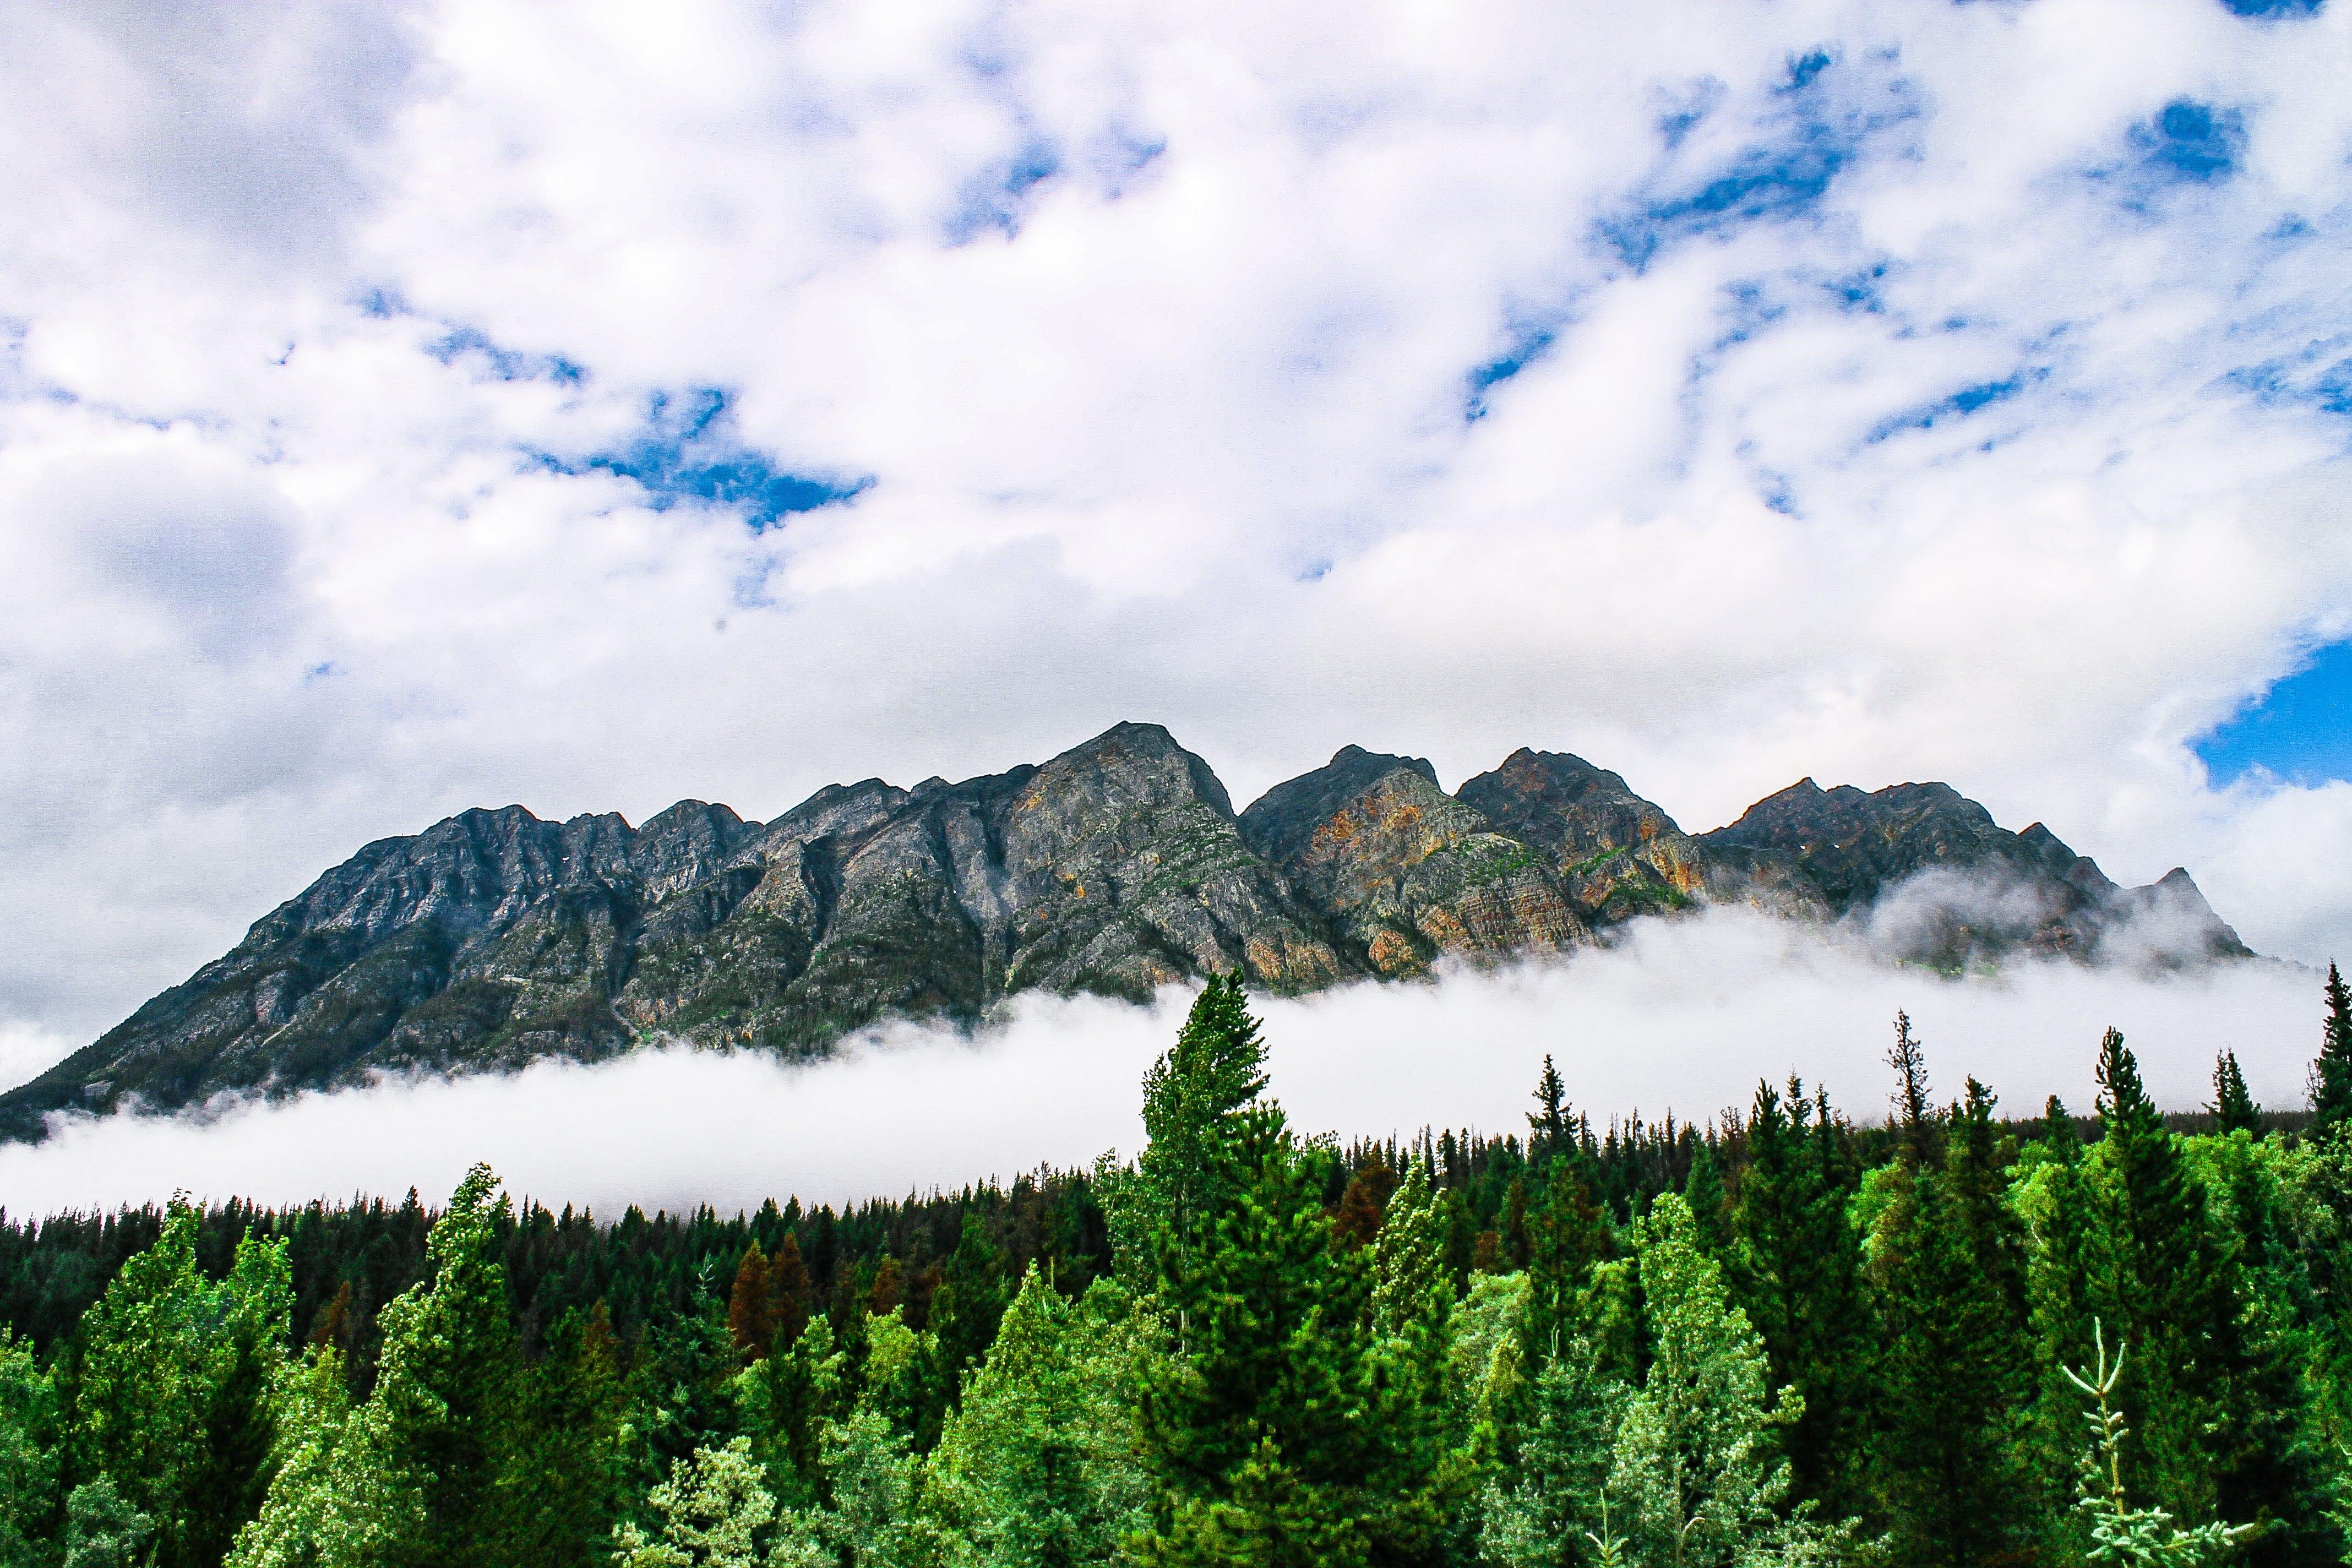 Kostenloses Stock Foto zu 4k wallpaper, bäume, berg, berge